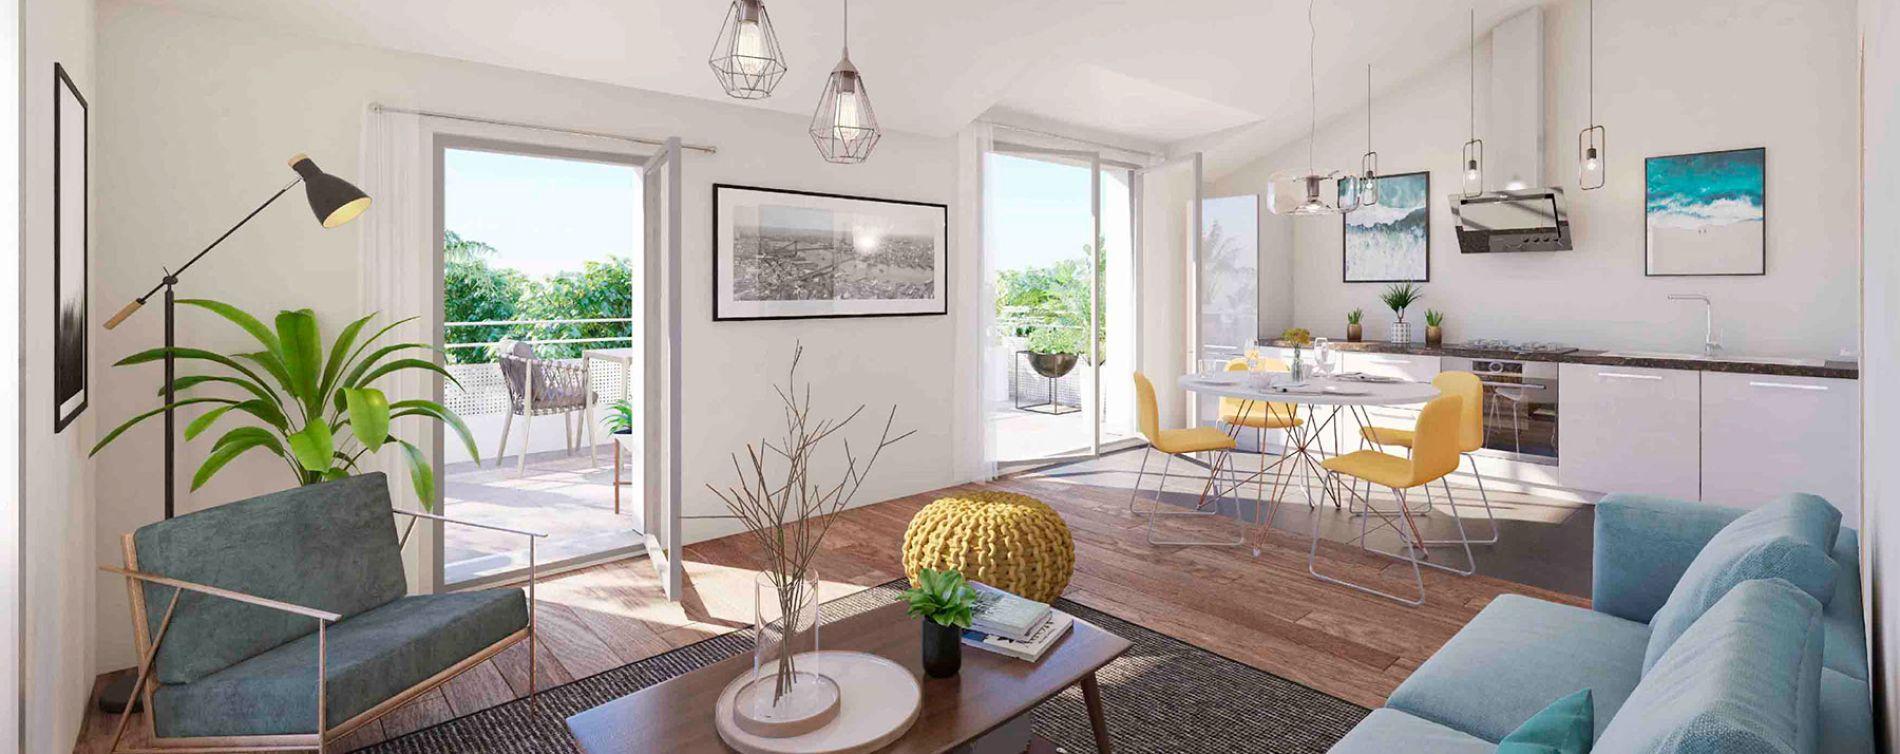 Neuilly-sur-Marne : programme immobilier neuve « Côté Jardin » (4)